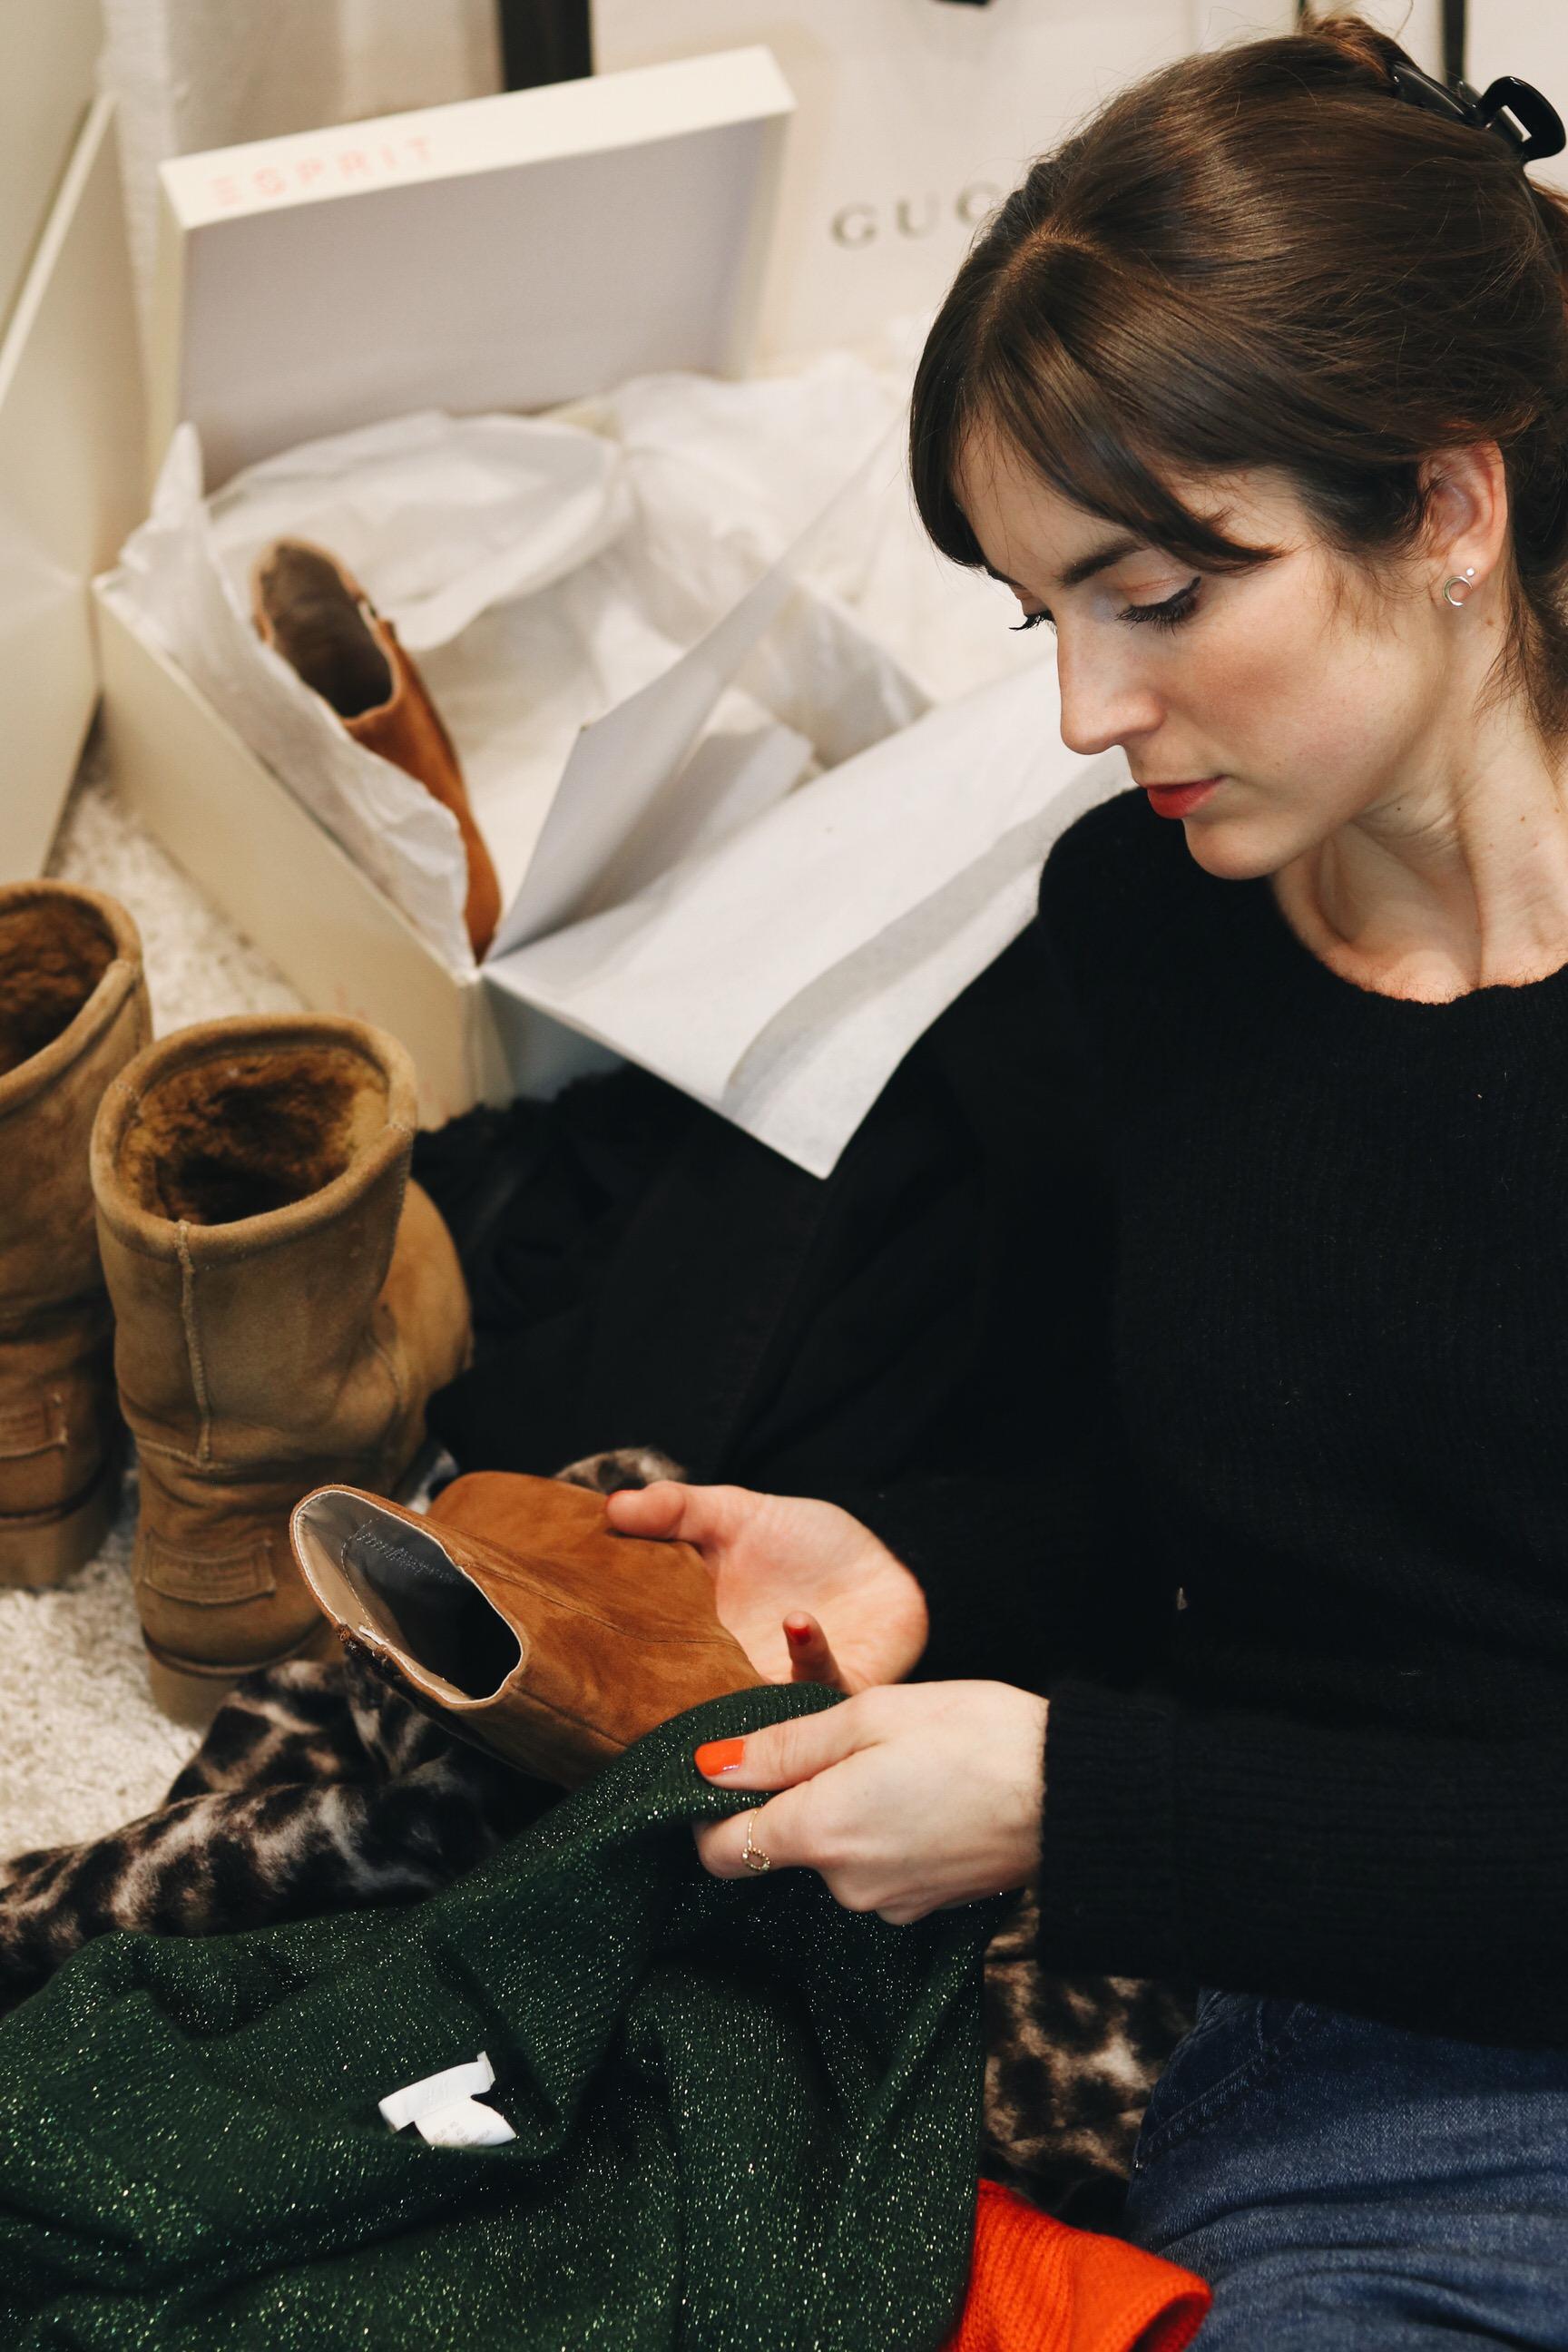 Modeblog Fehlkaeufe verhindern ideen